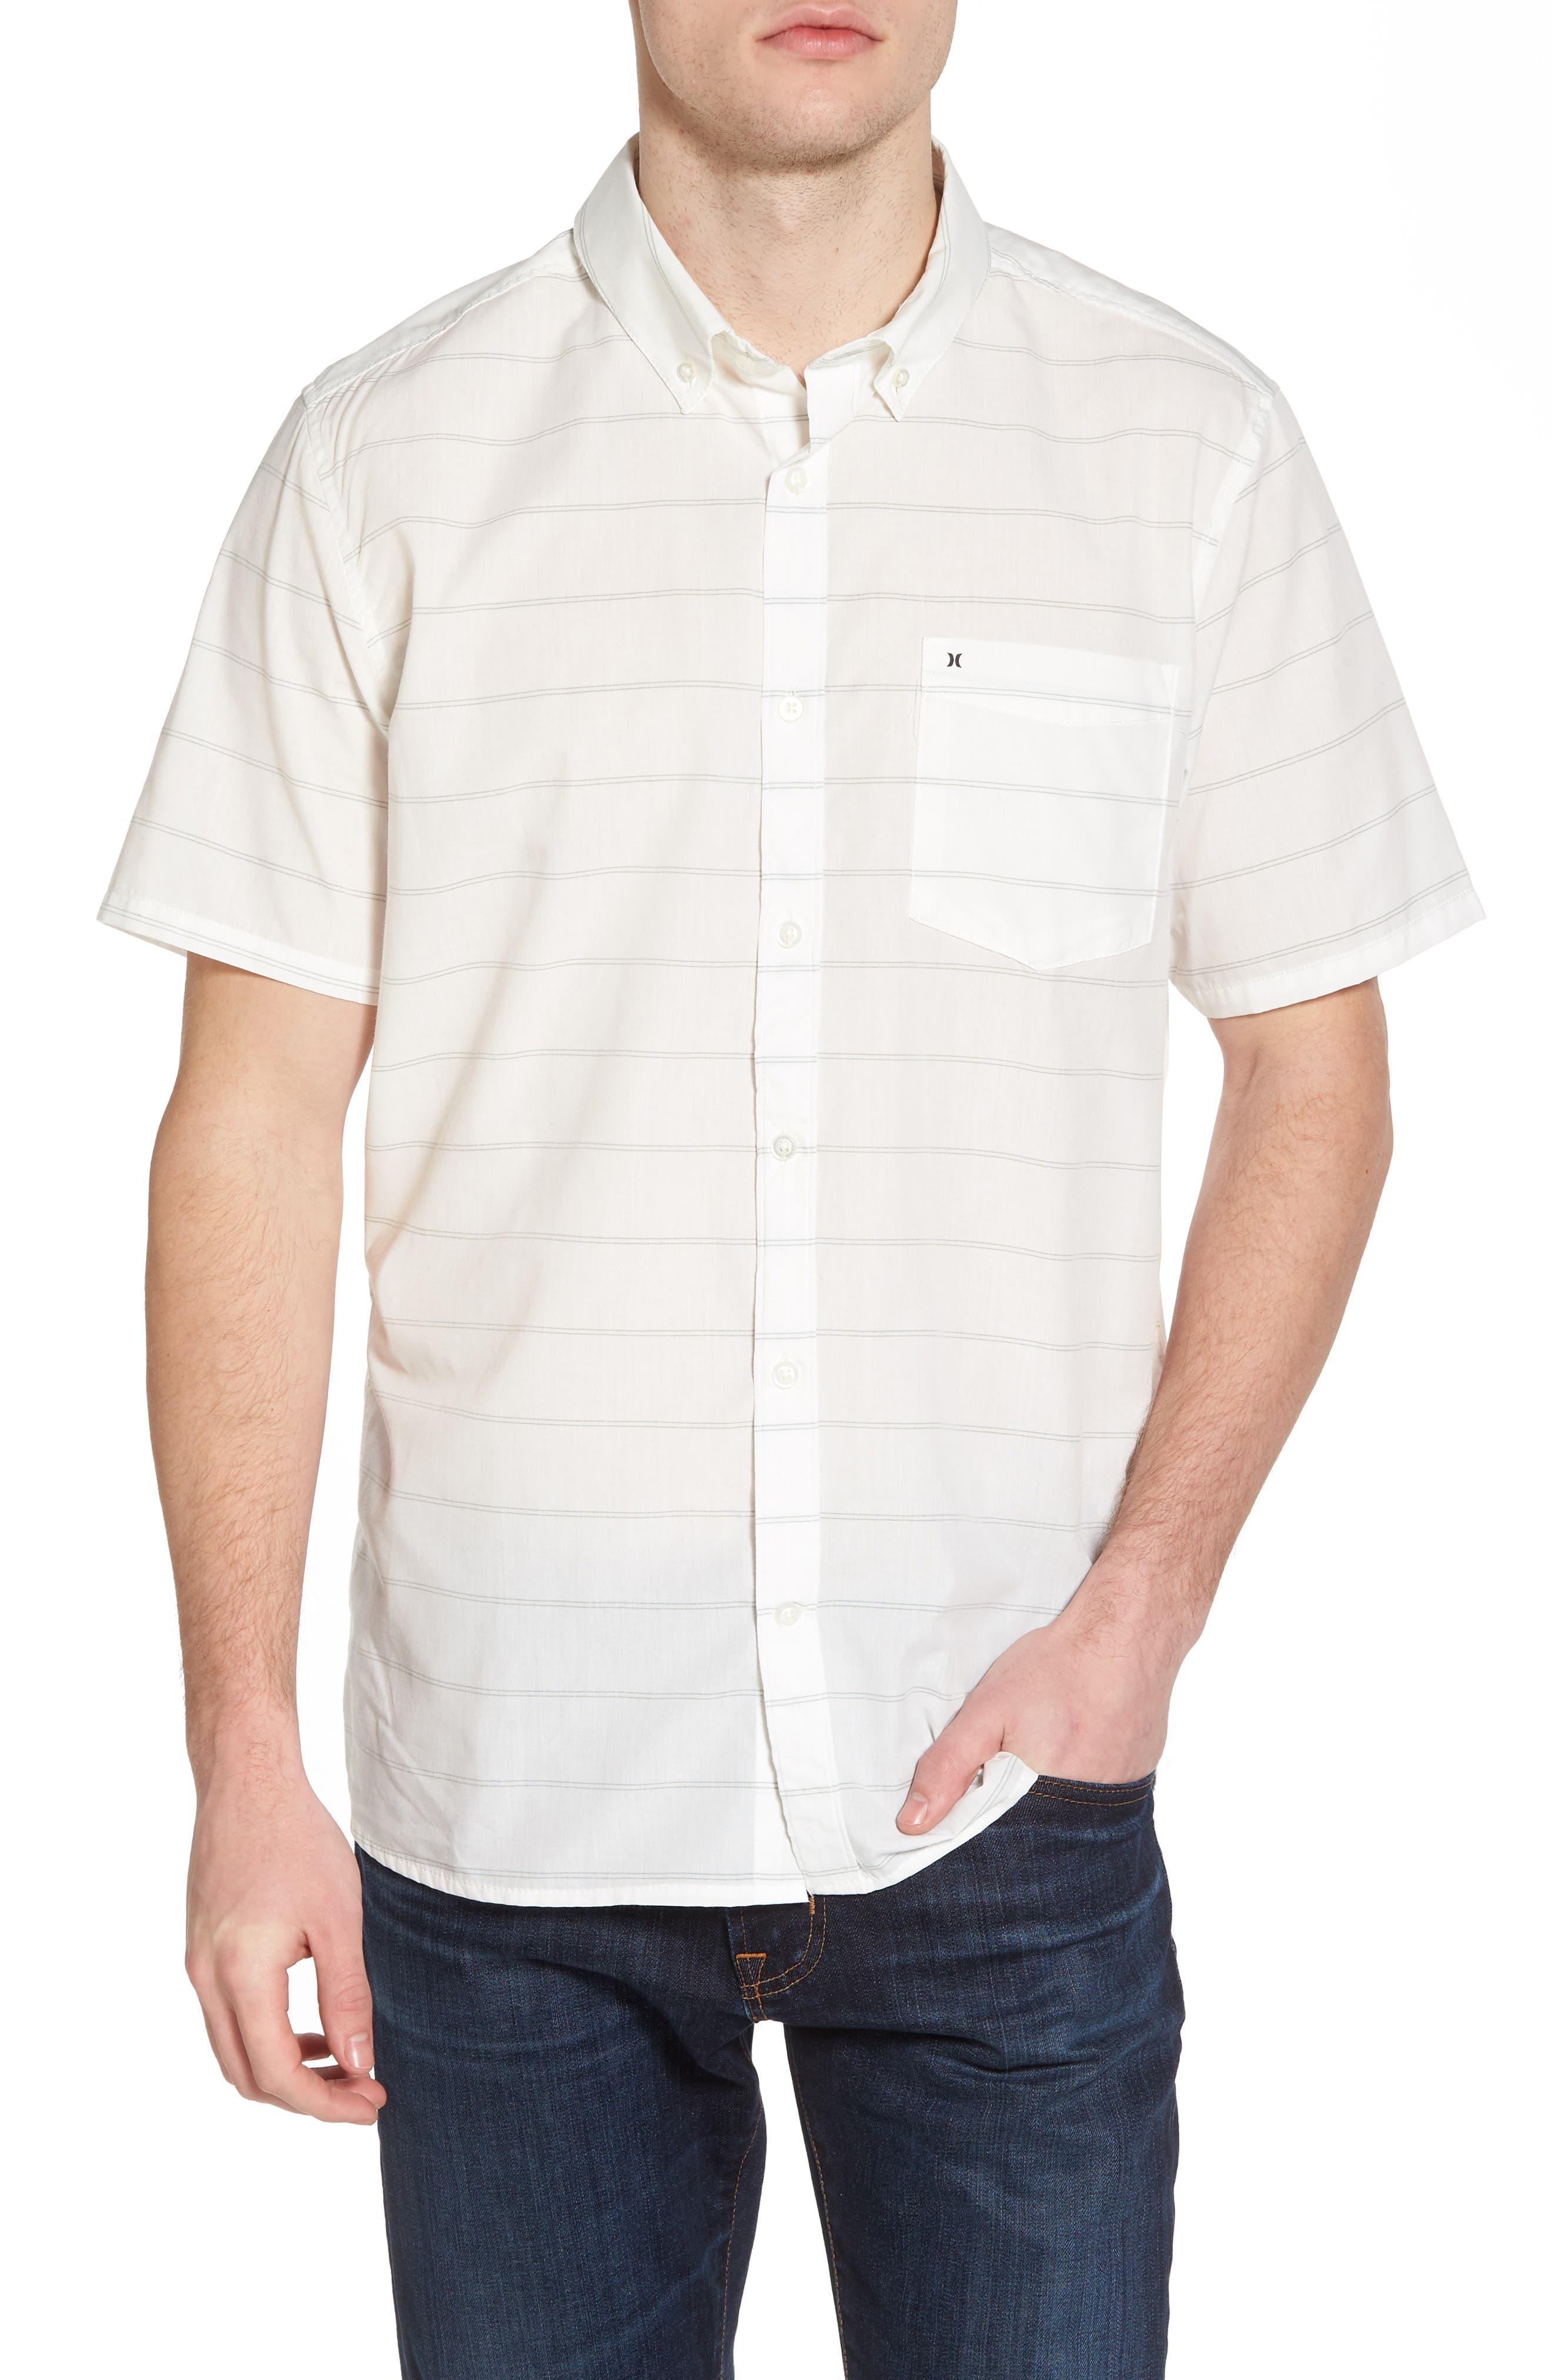 Reeder Dry Woven Shirt,                         Main,                         color, Sail